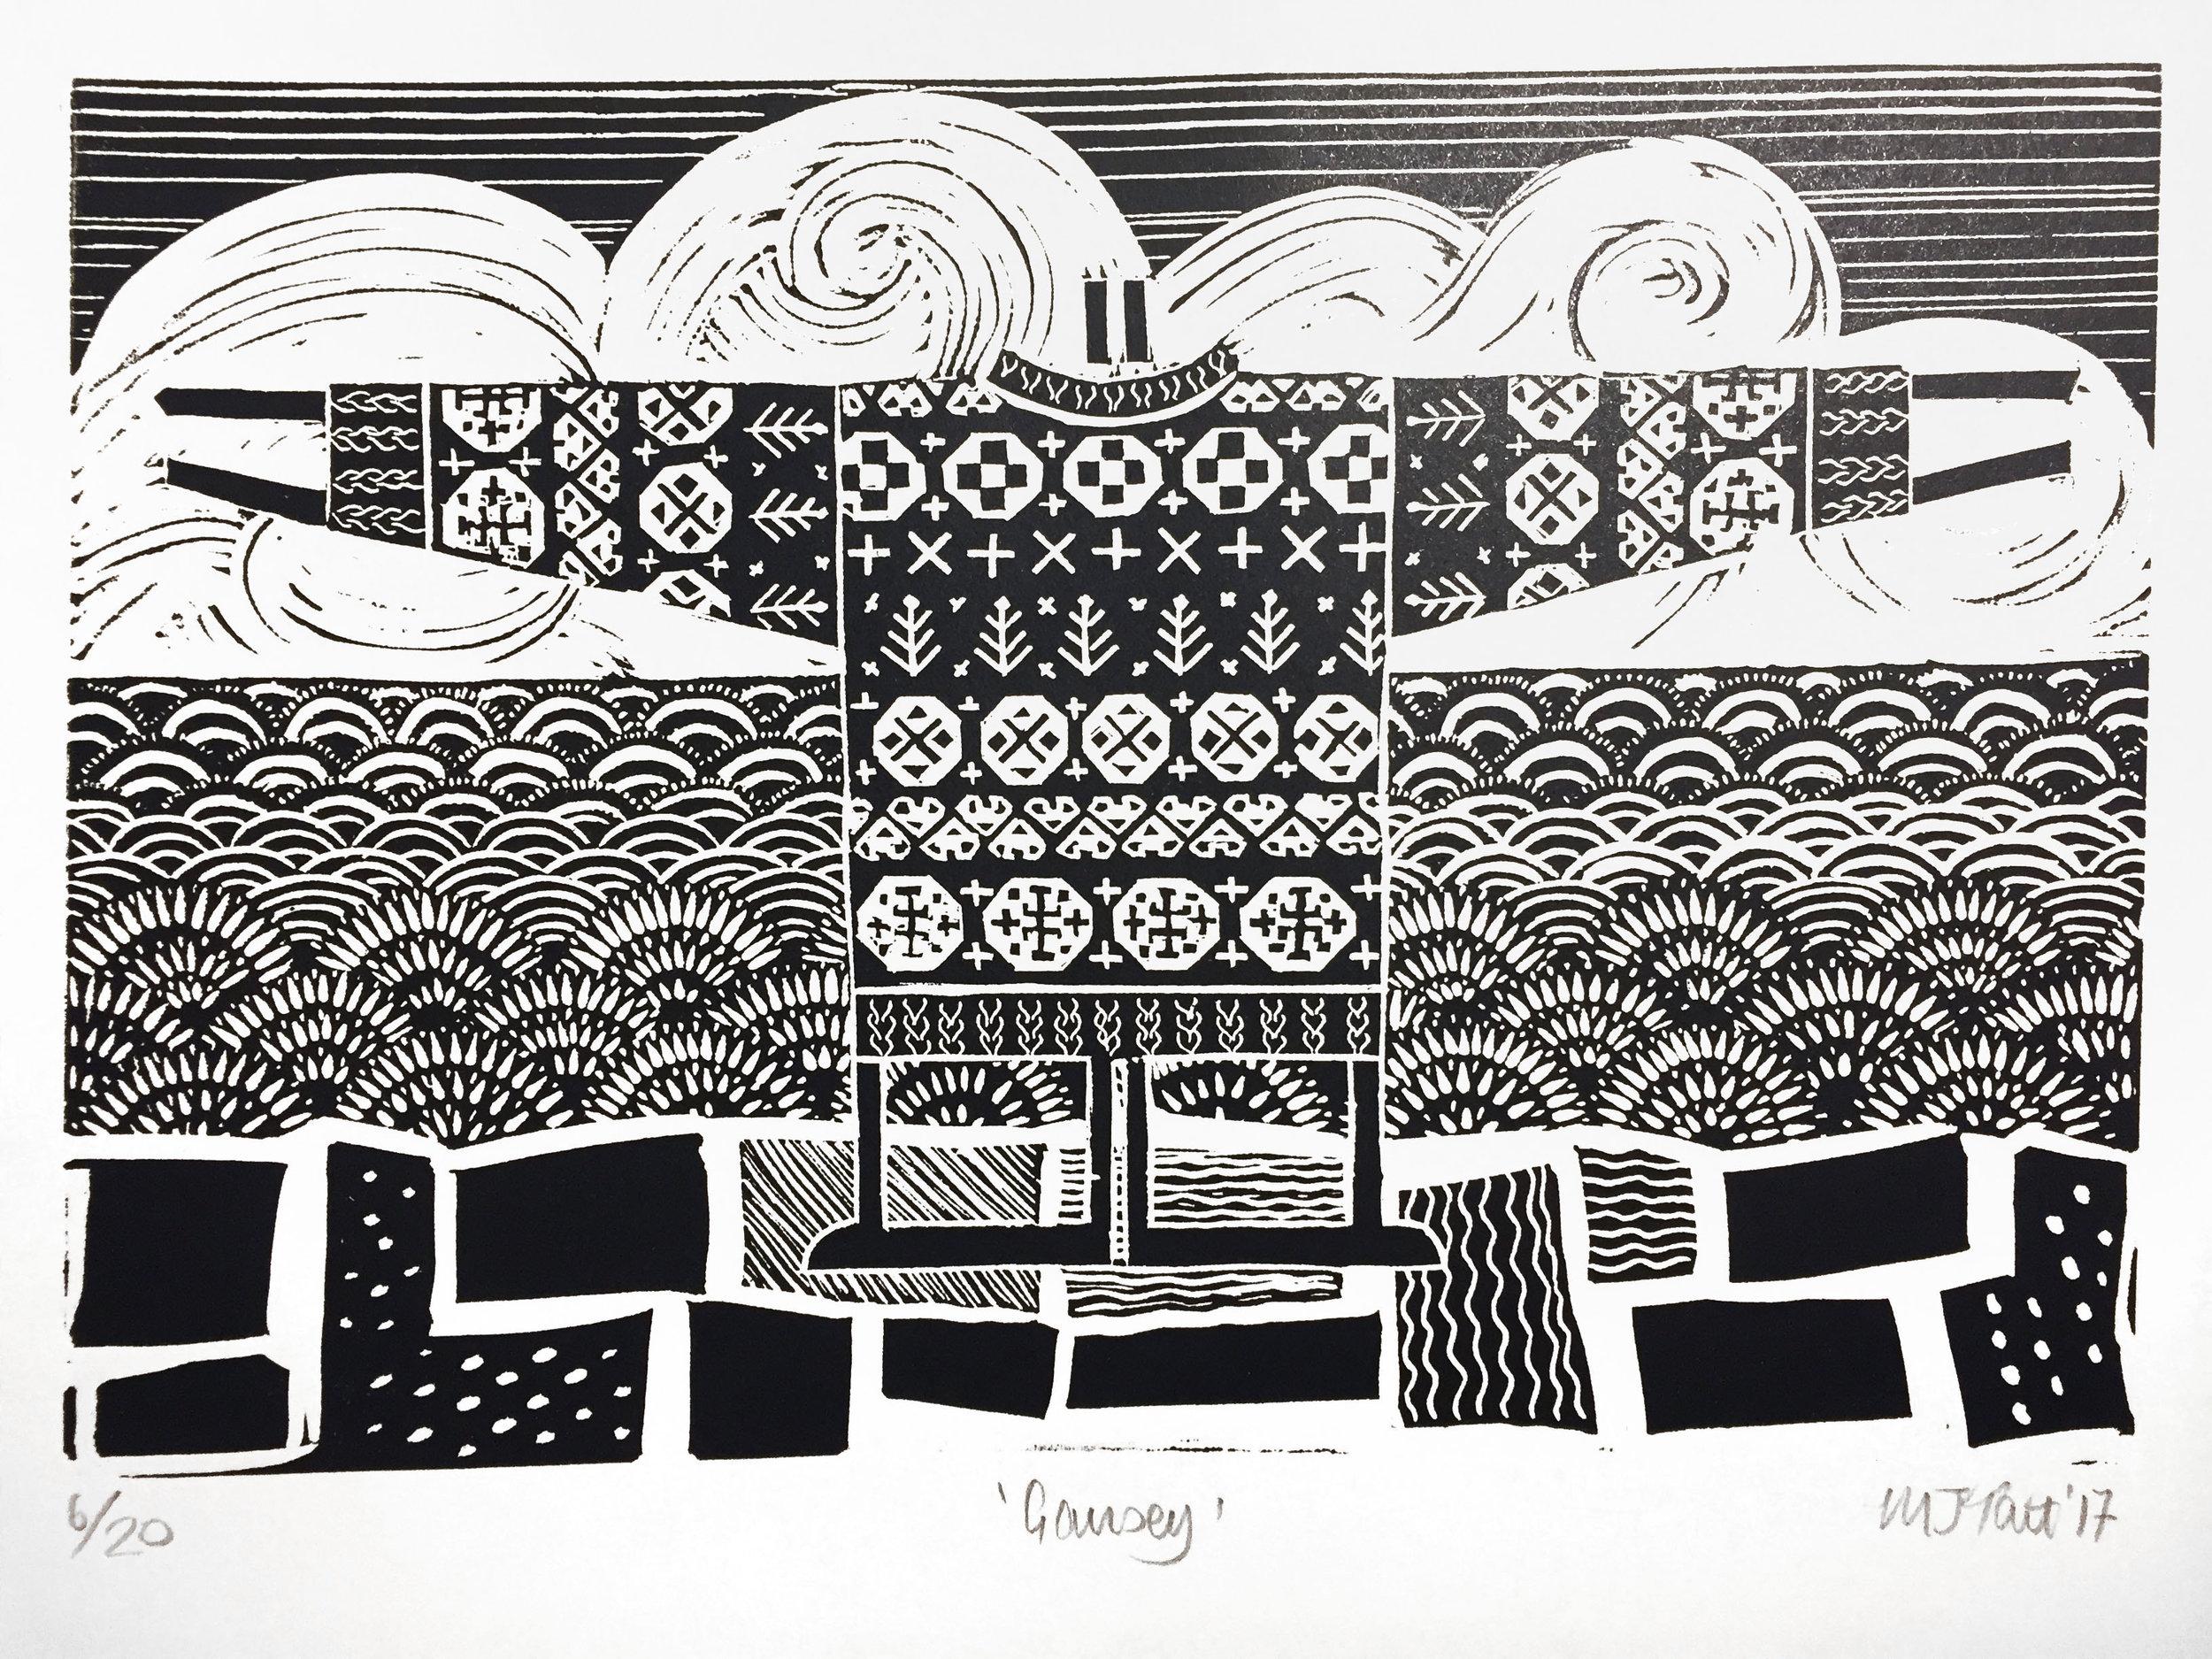 Limited edition print 'Gansey' by  Natty Maid